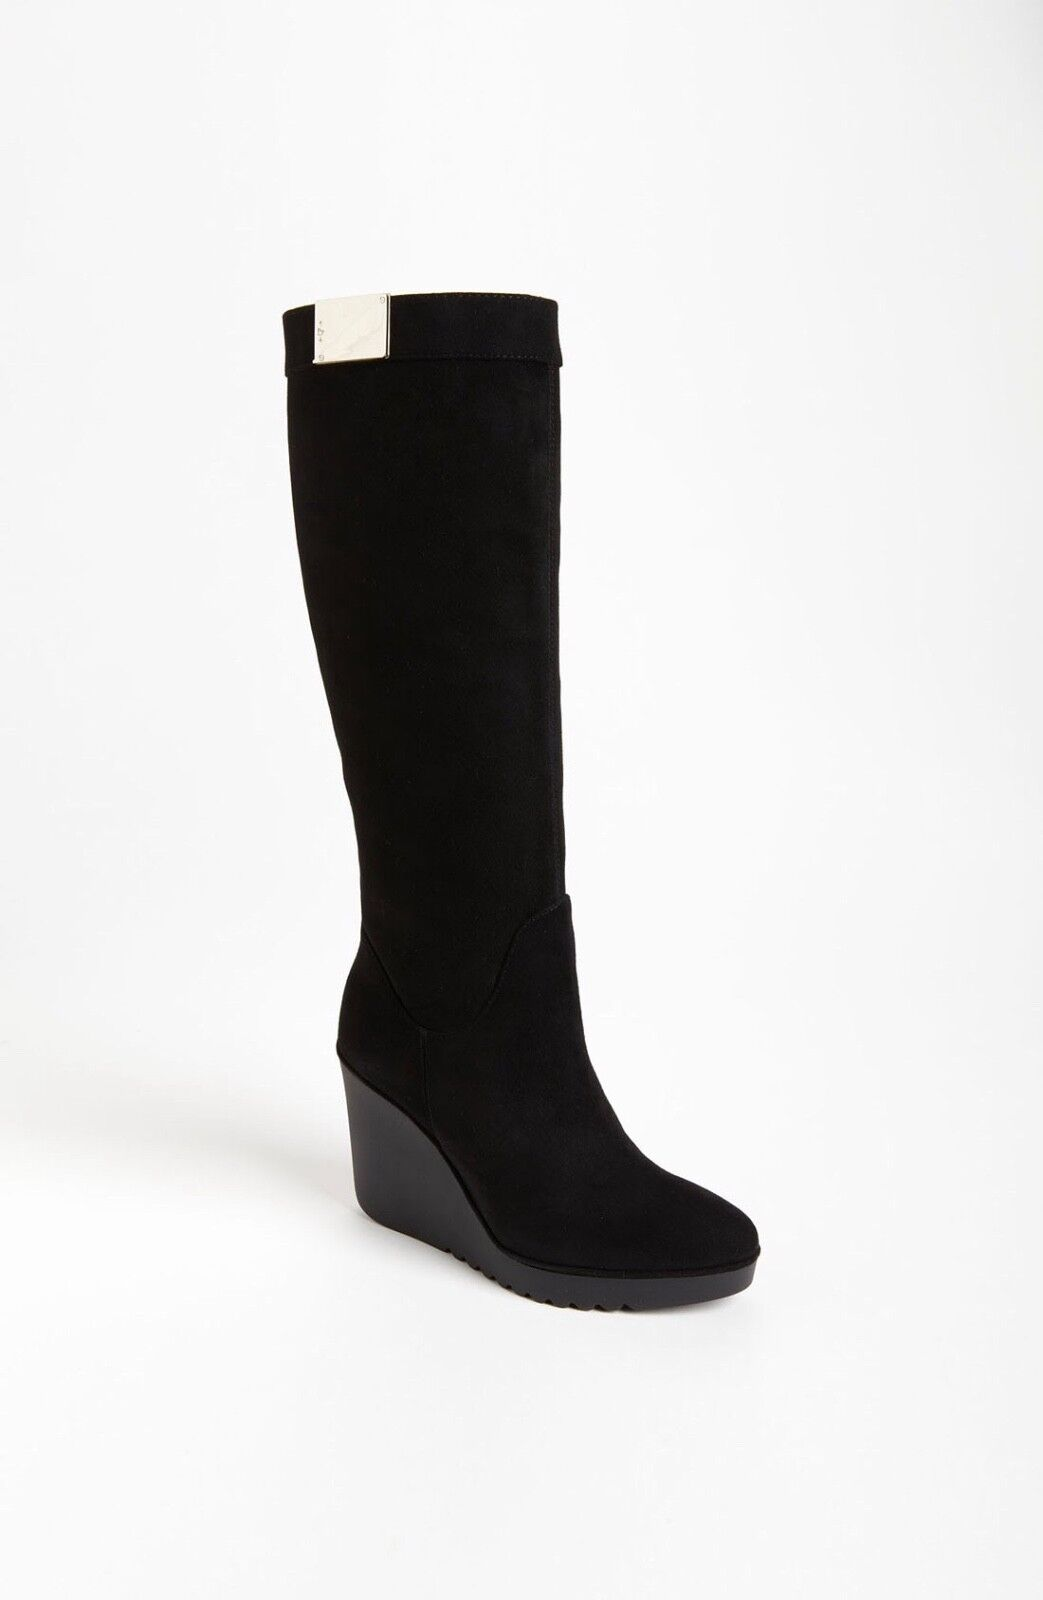 DONALD J. PLINER Lliya 02 Wedge Black Calf Calf Calf Suede Leather Boots SZ 10 Authentic b004bc